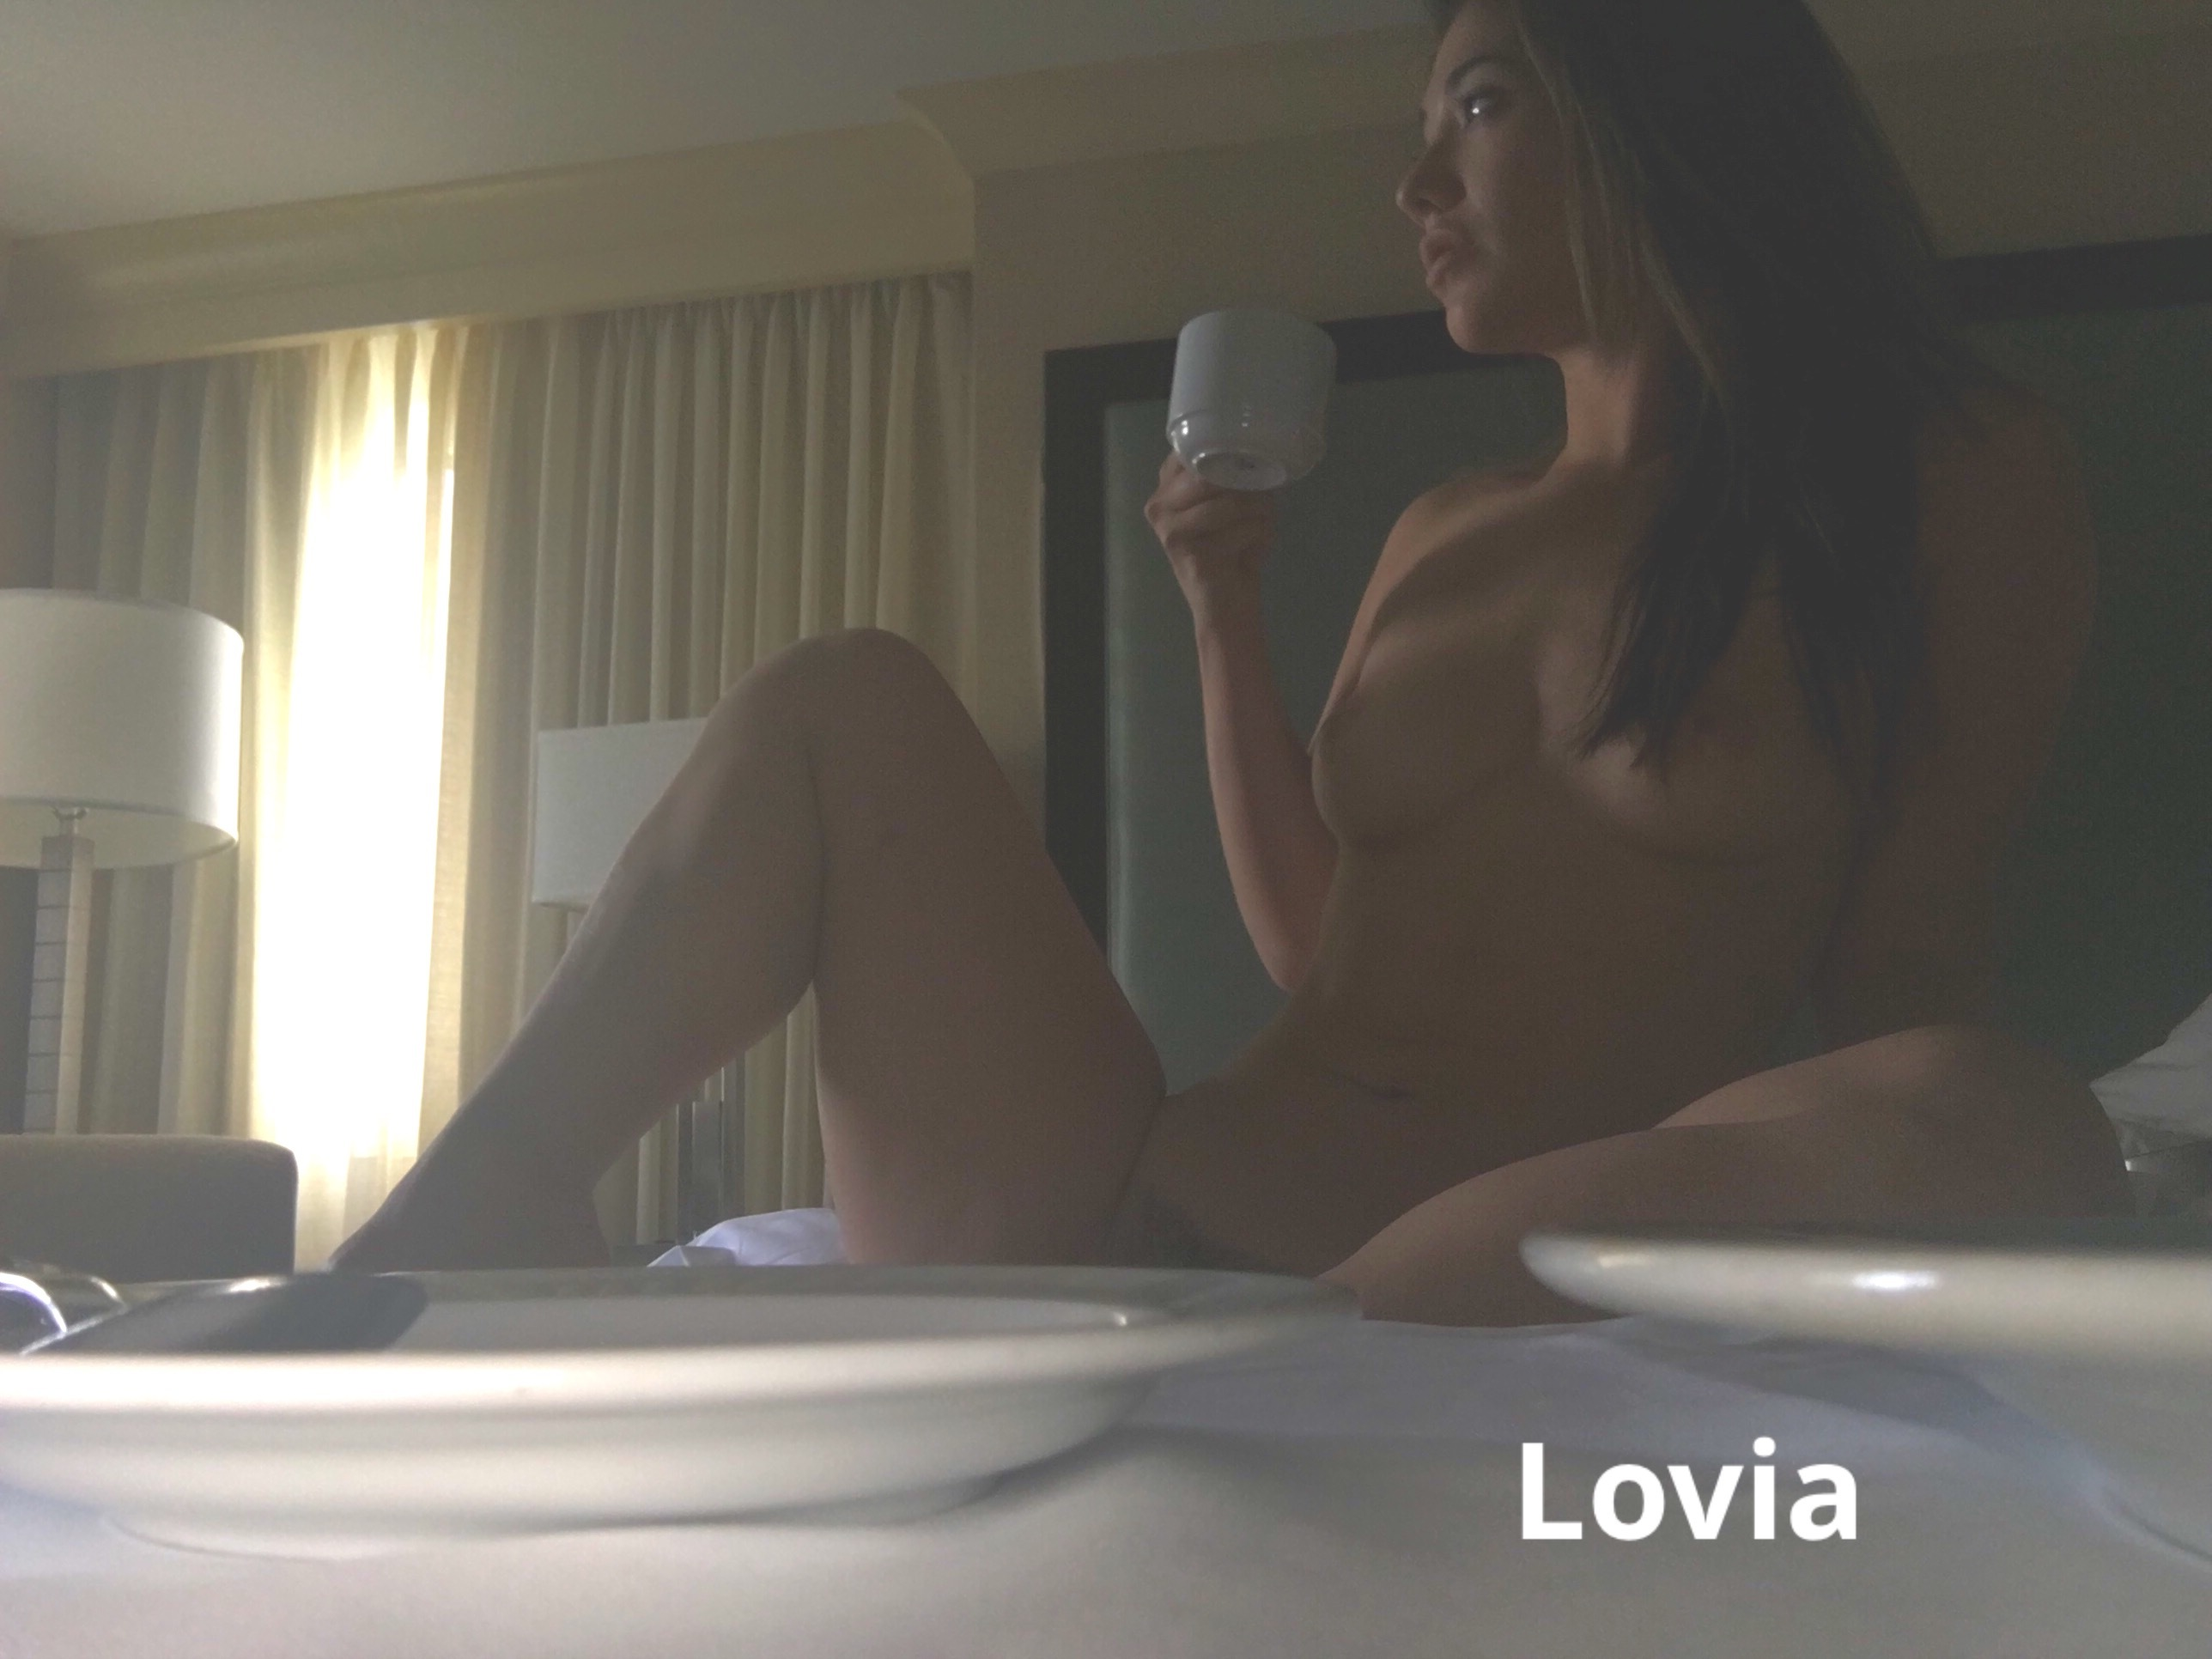 Eva Lovia, Fallinlovia, Onlyfans 0016